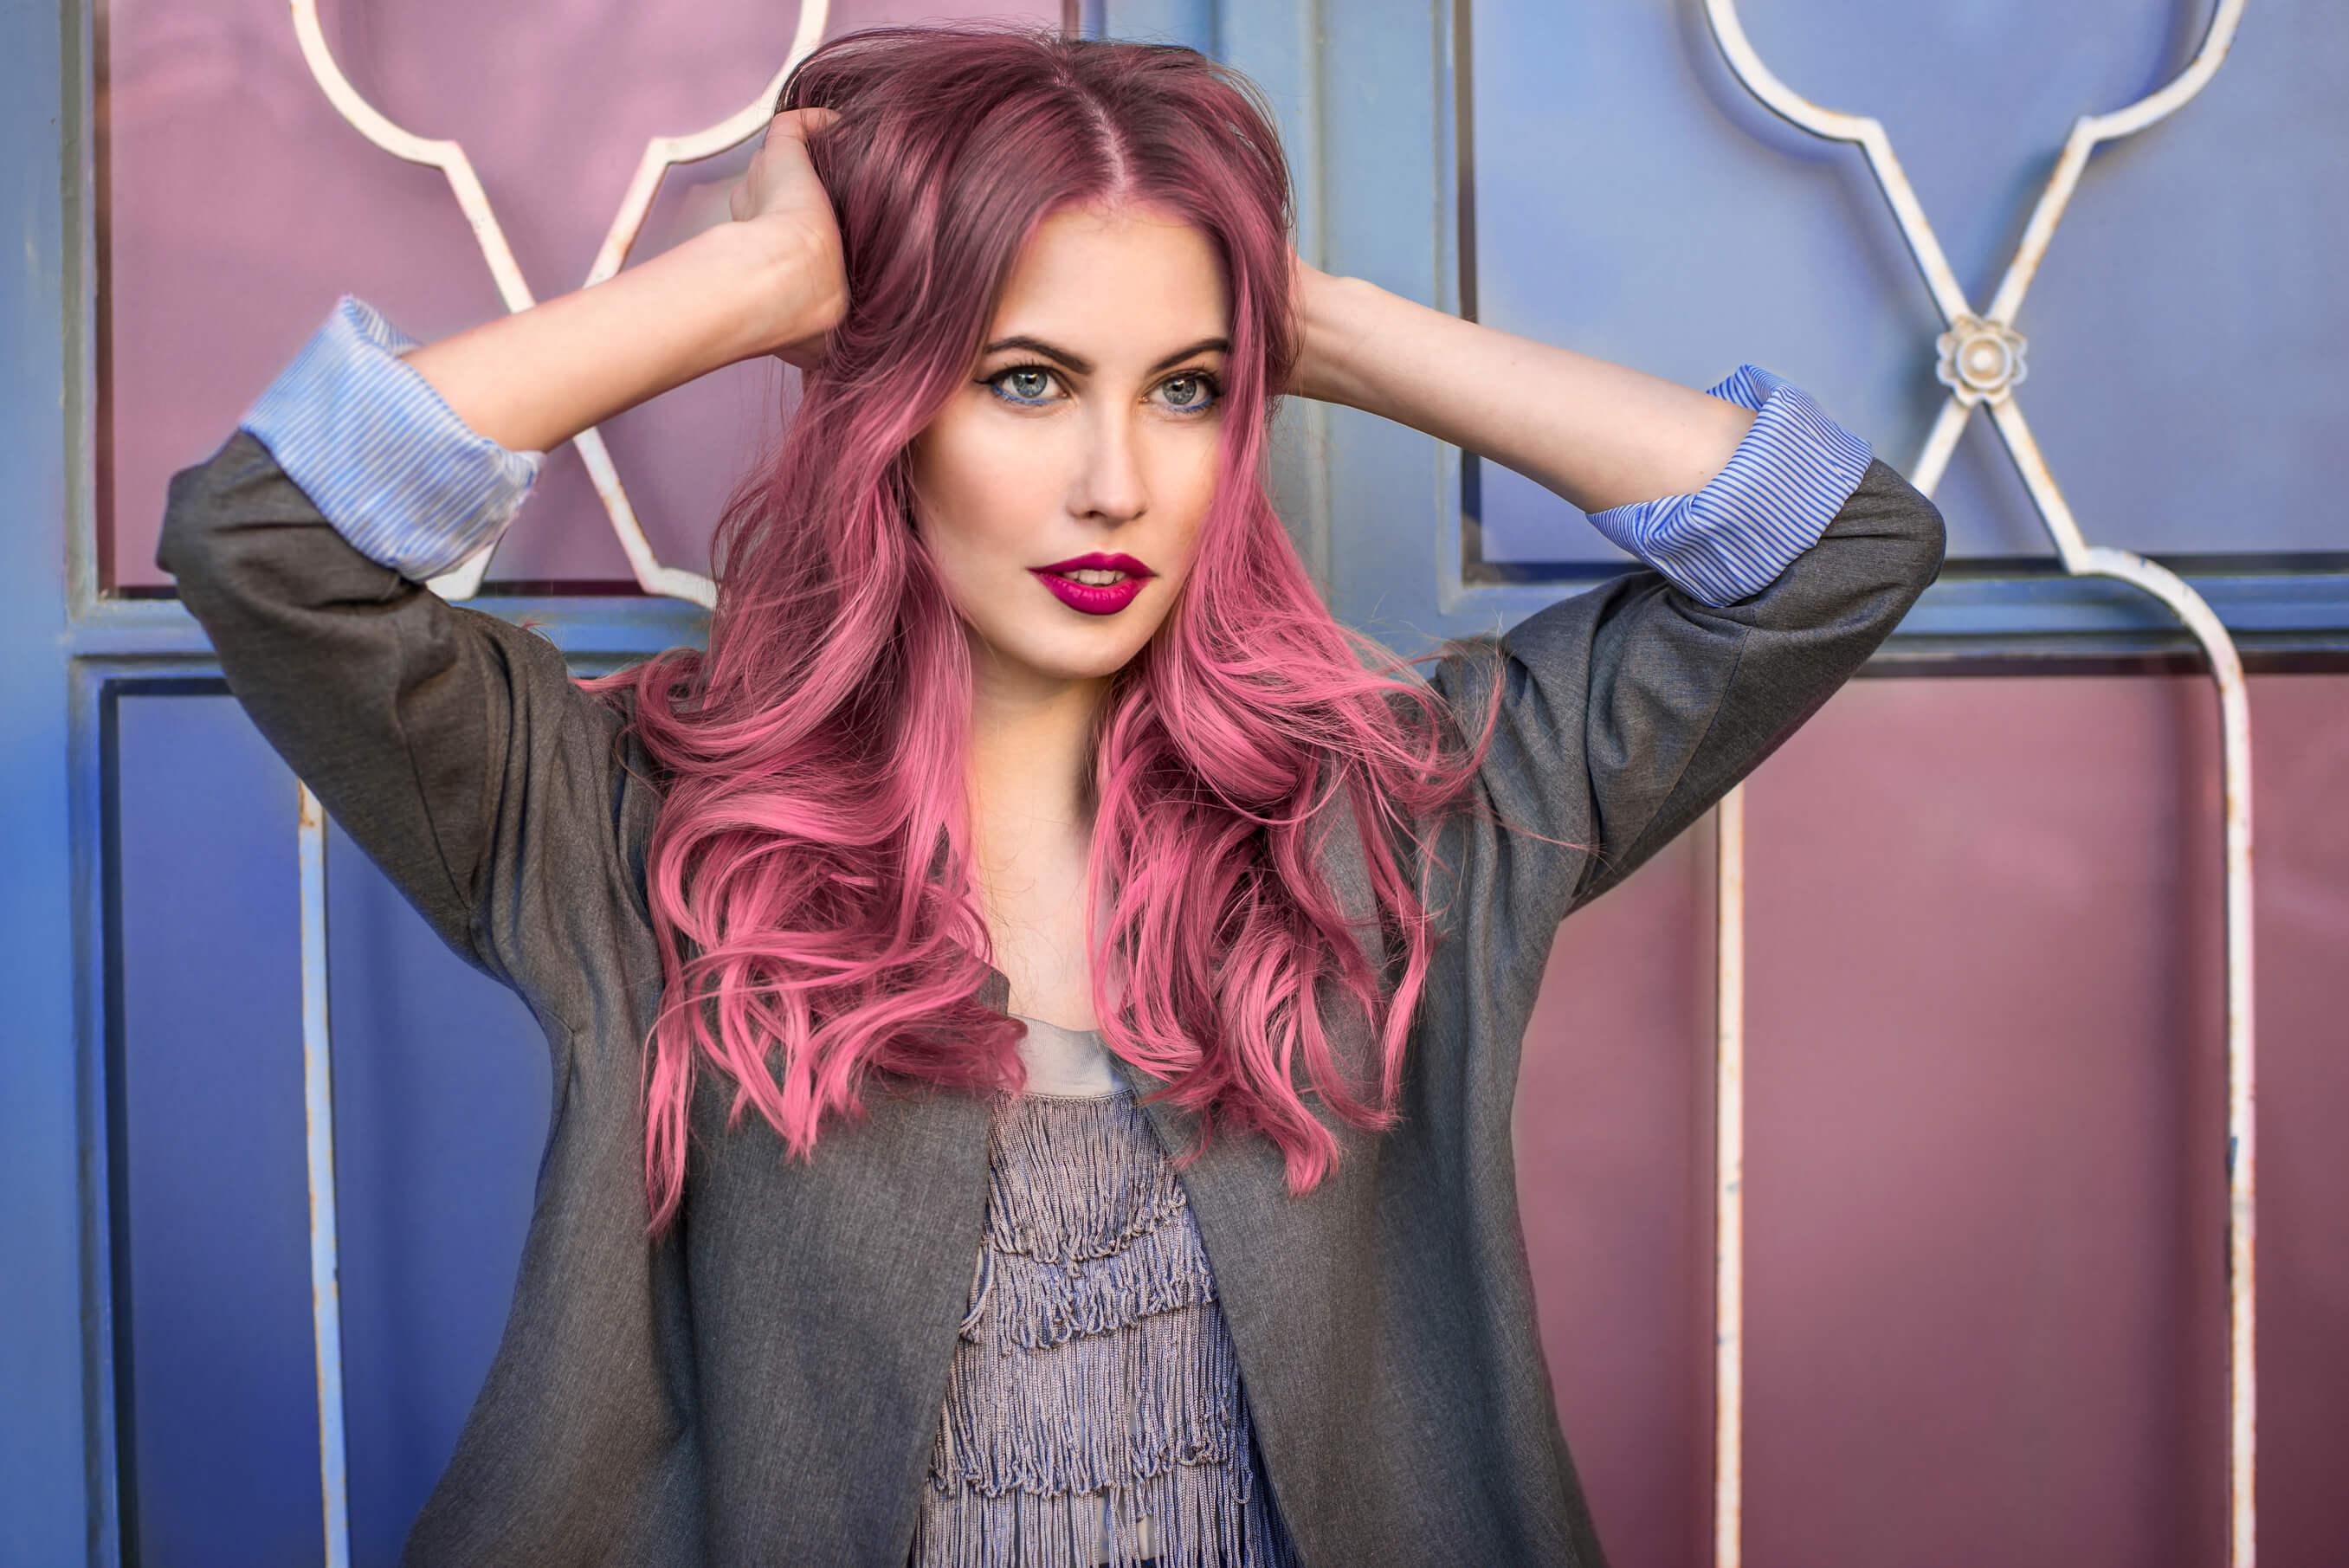 does hair dye damage your hair